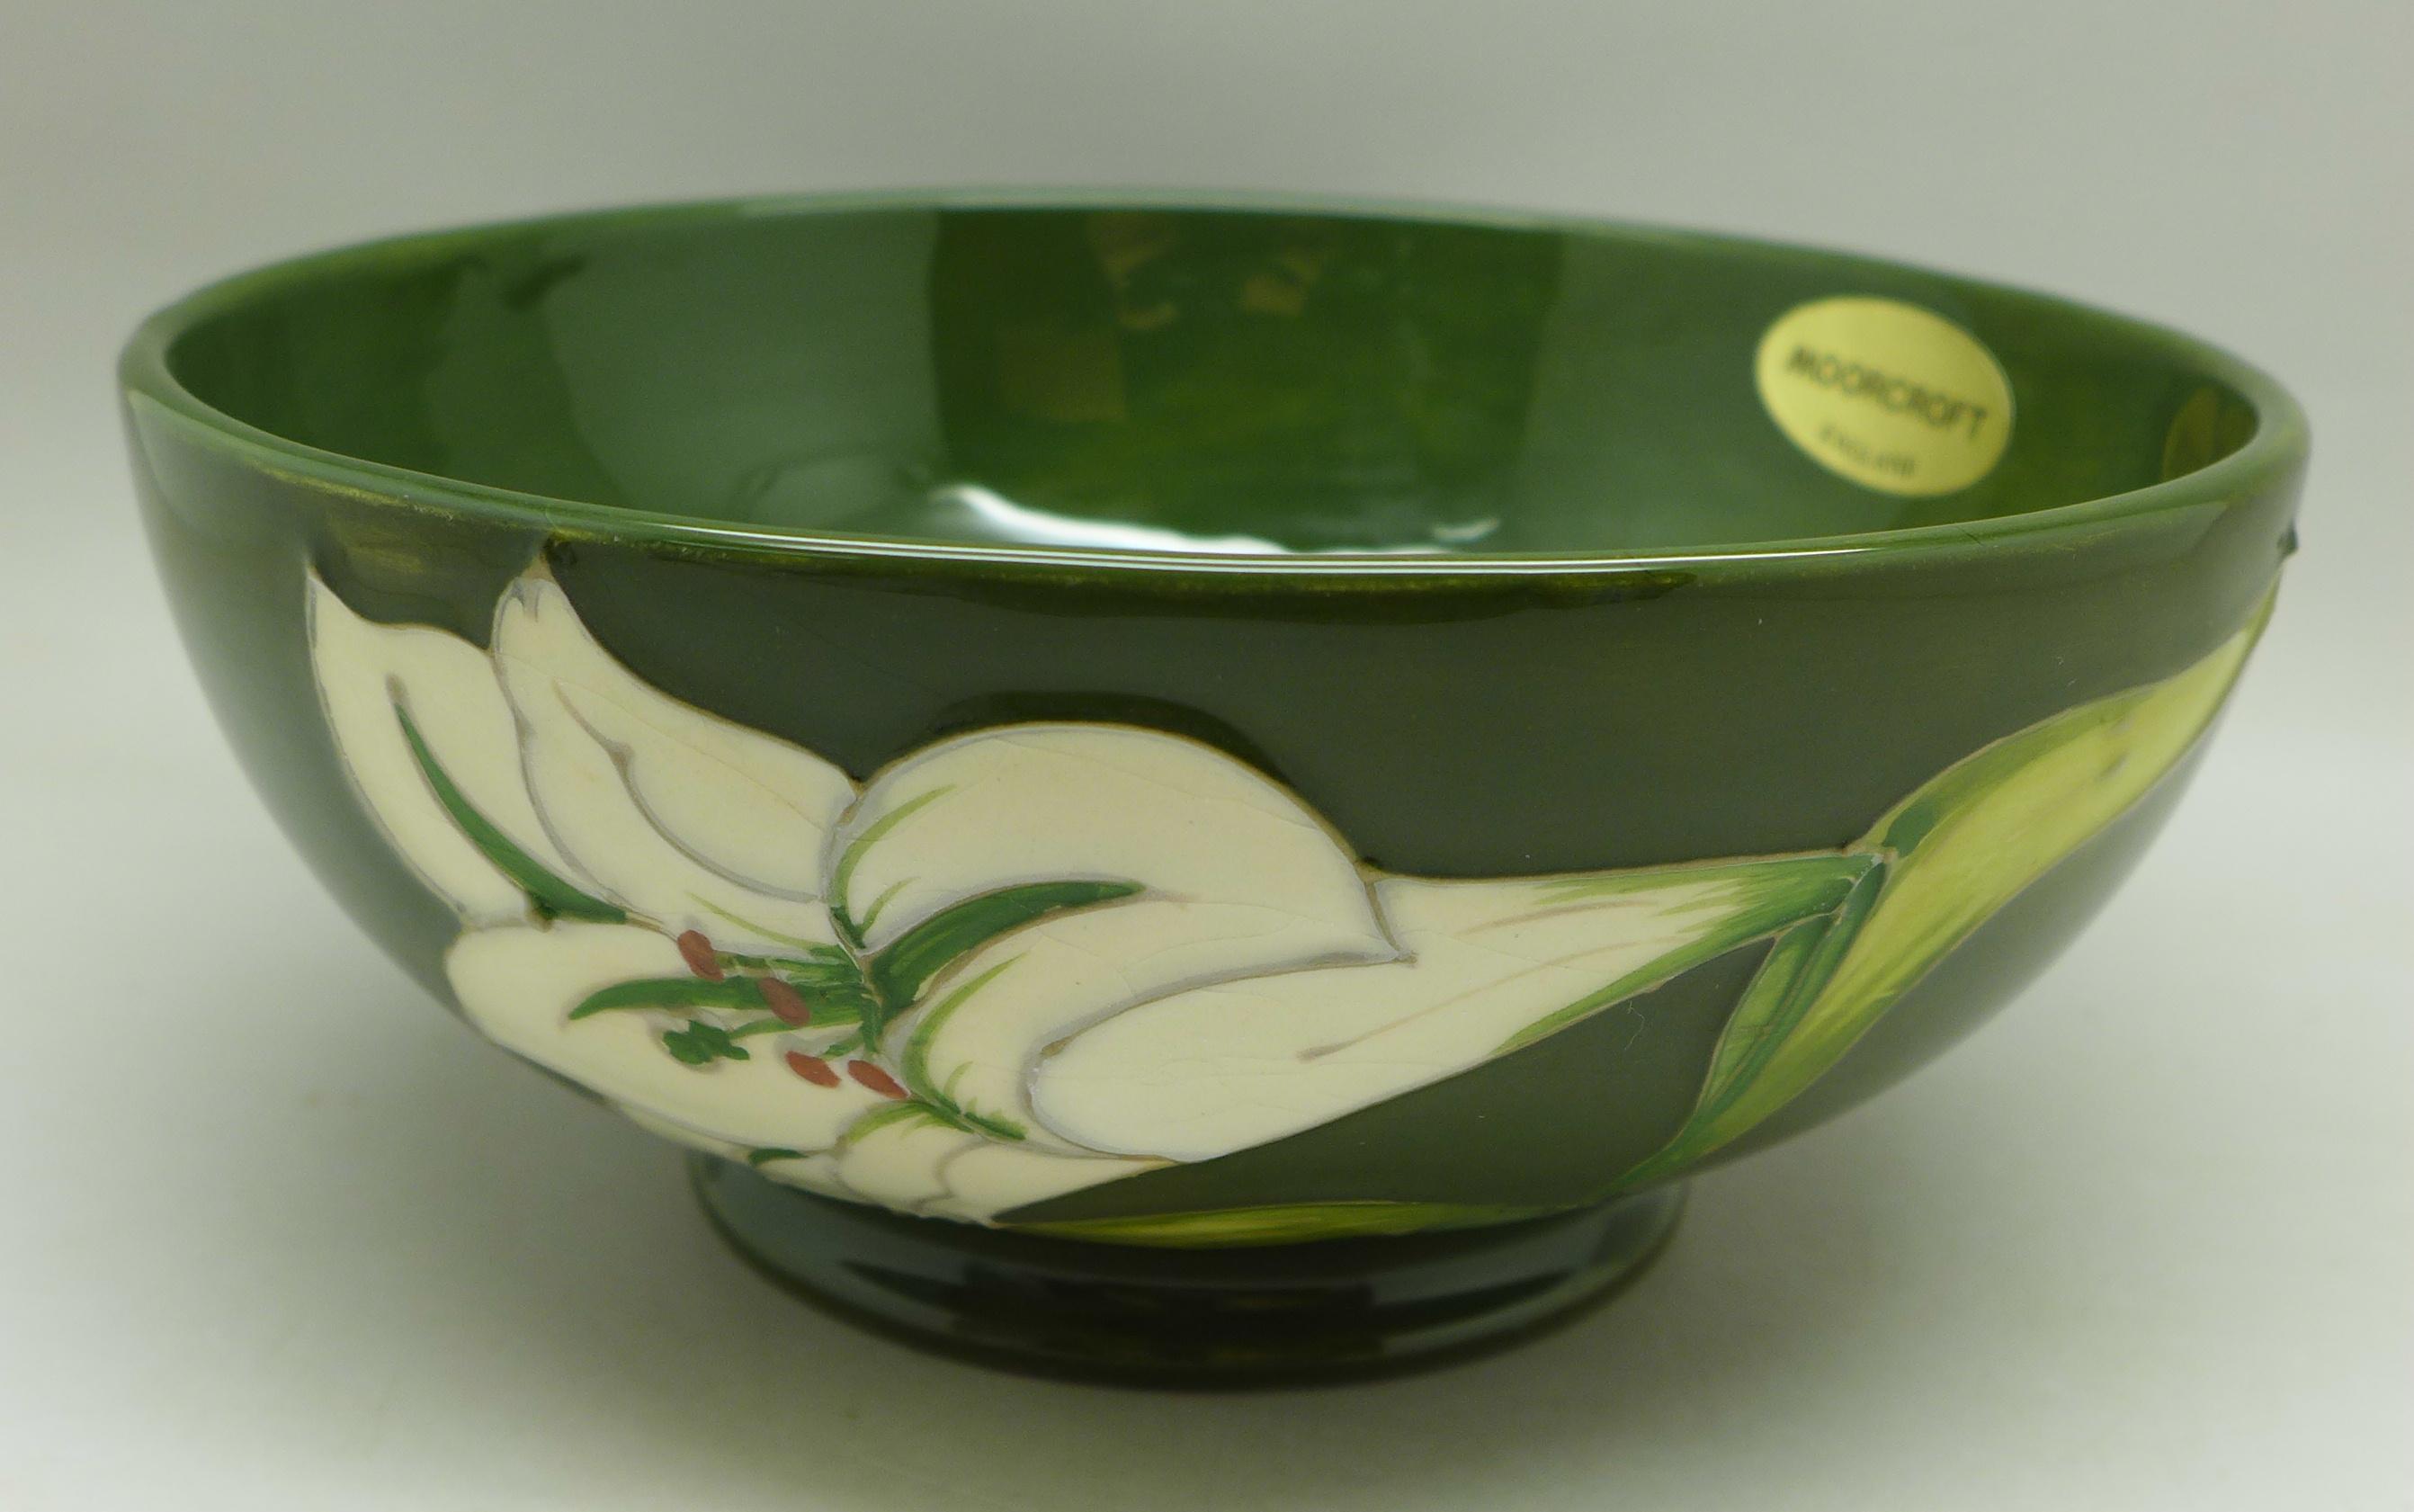 A Moorcroft Bermuda Lily bowl, 163mm diameter - Image 4 of 6